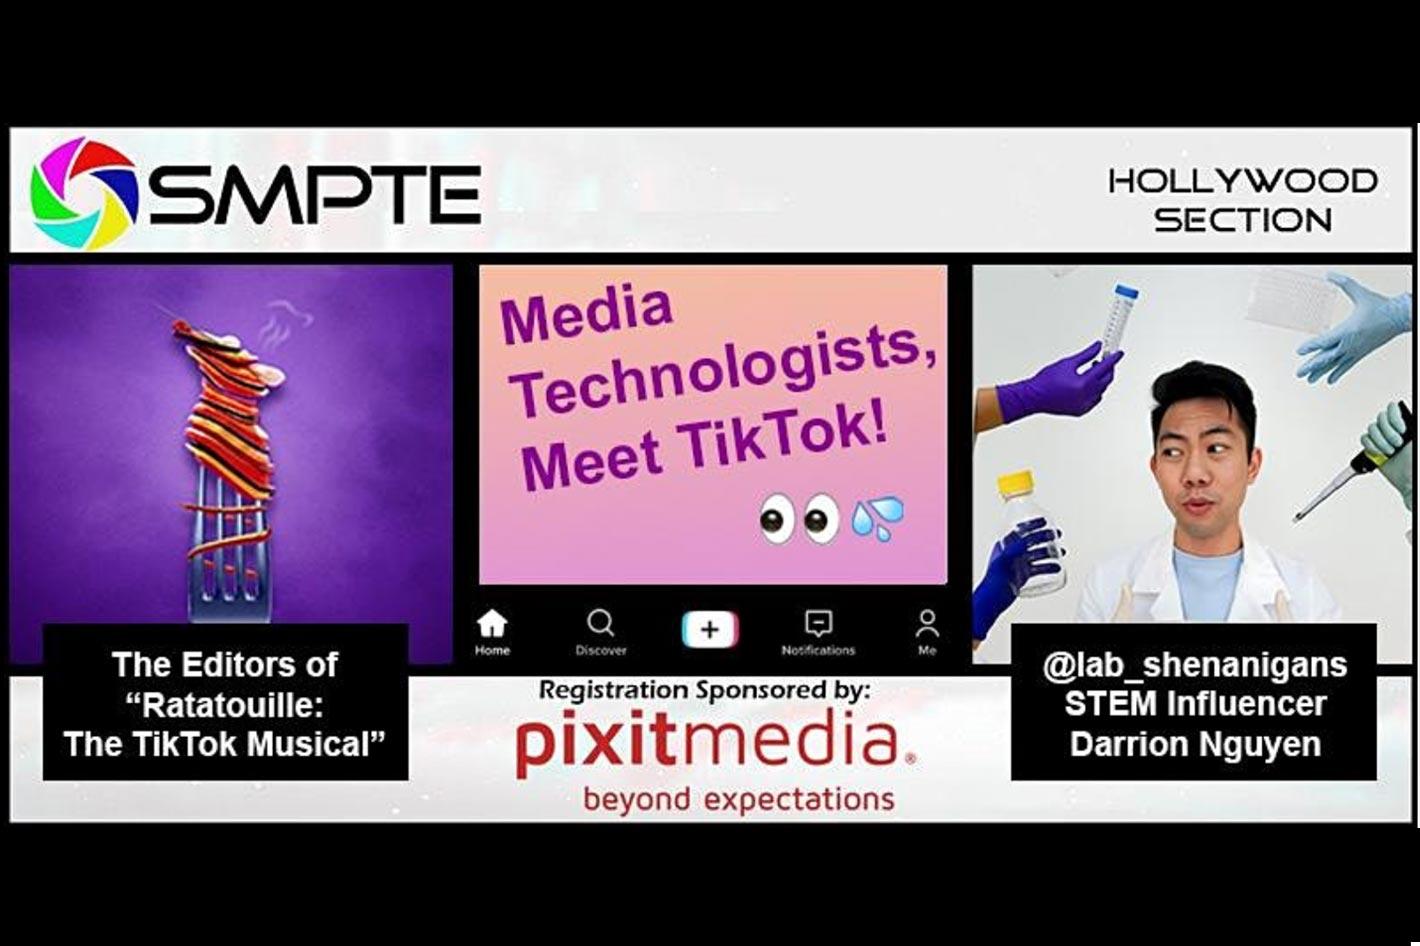 SMPTE Hollywood reveals the secrets of Tik Tok